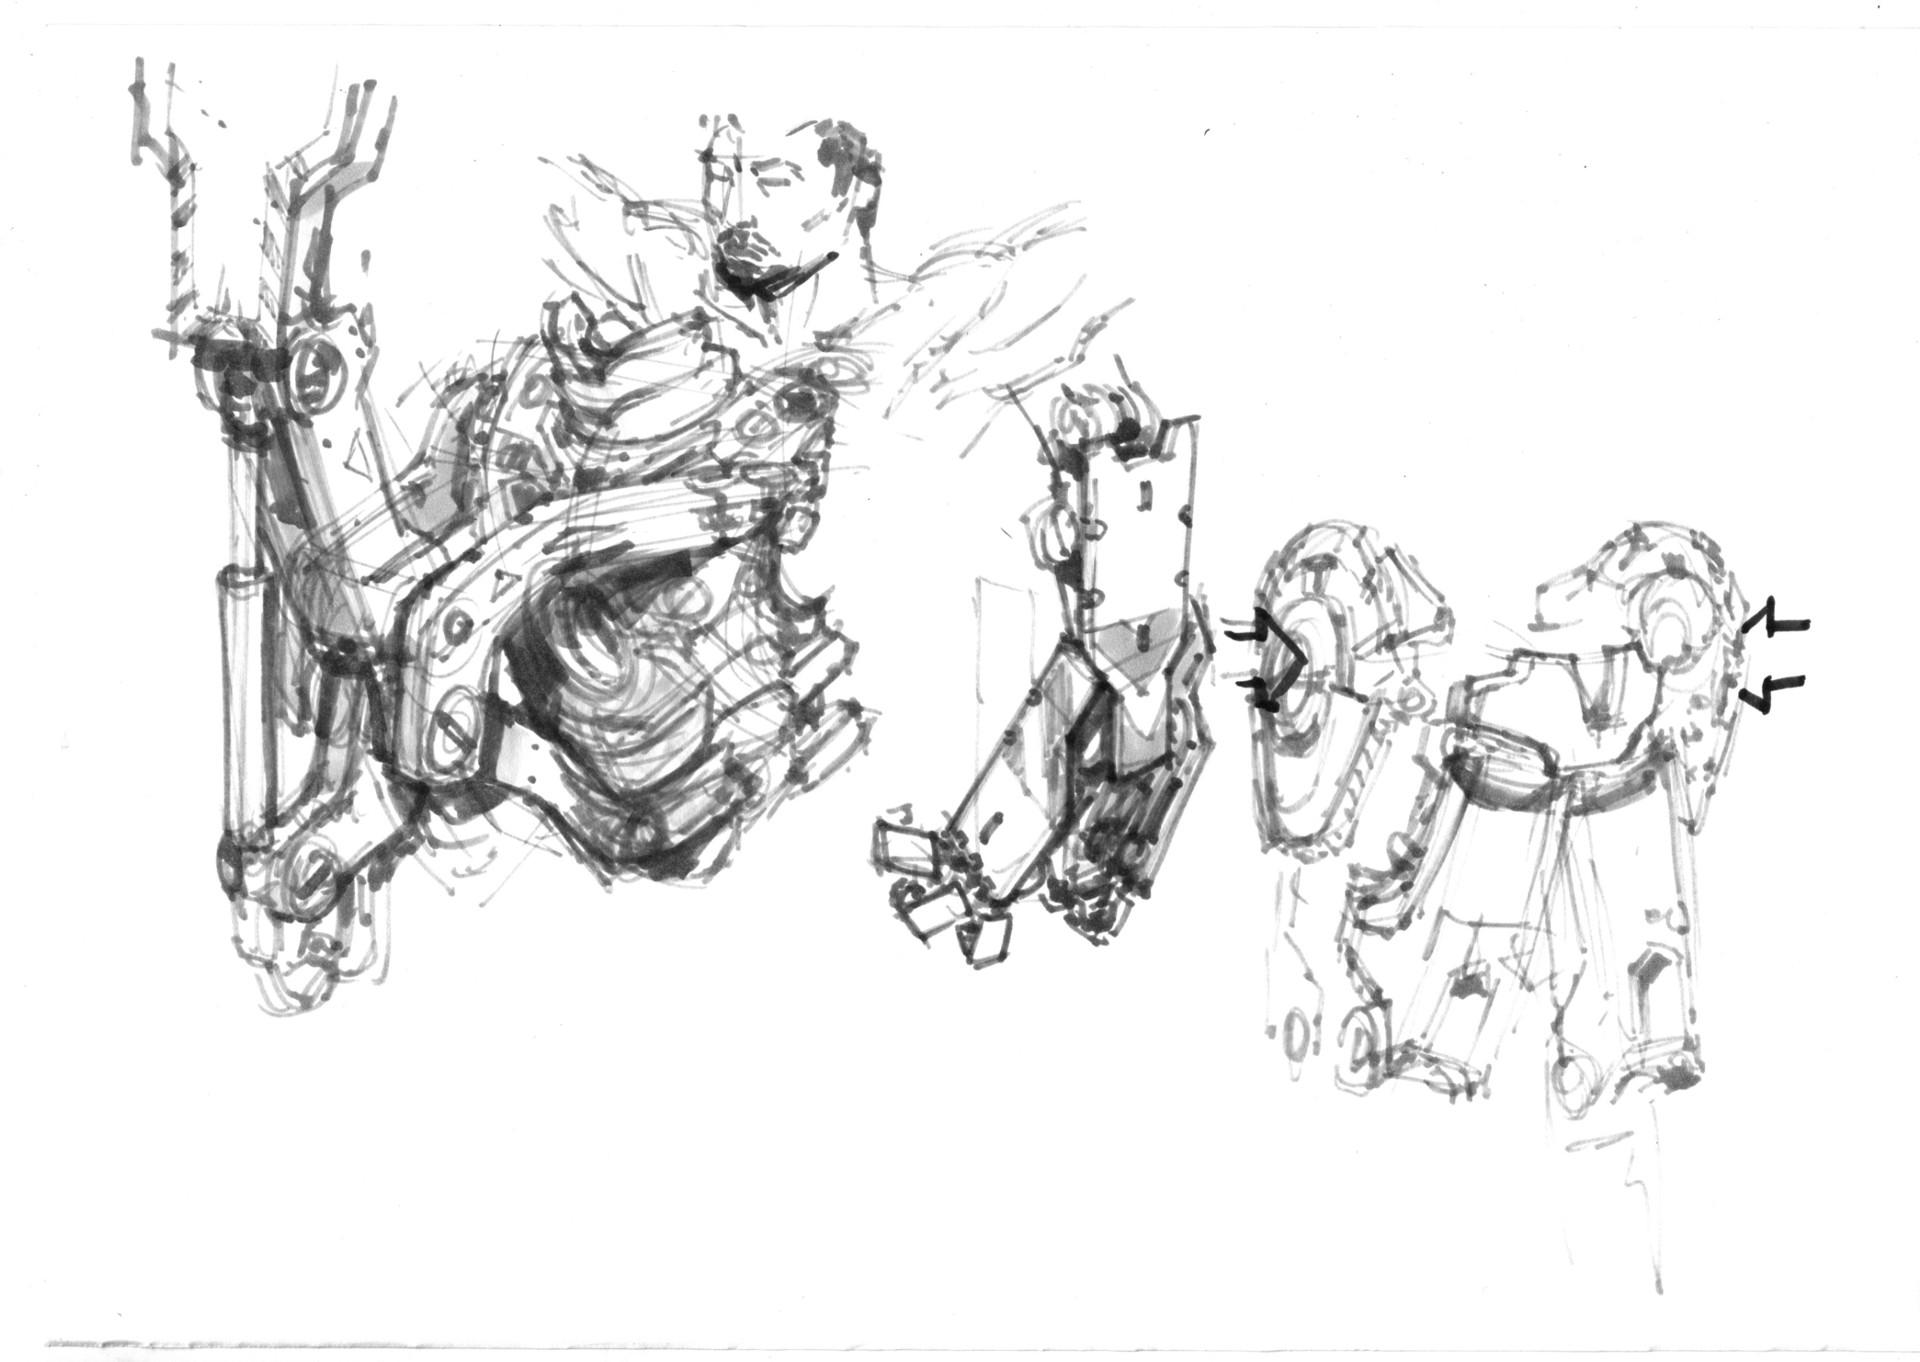 Phil saunders suit up sketch5